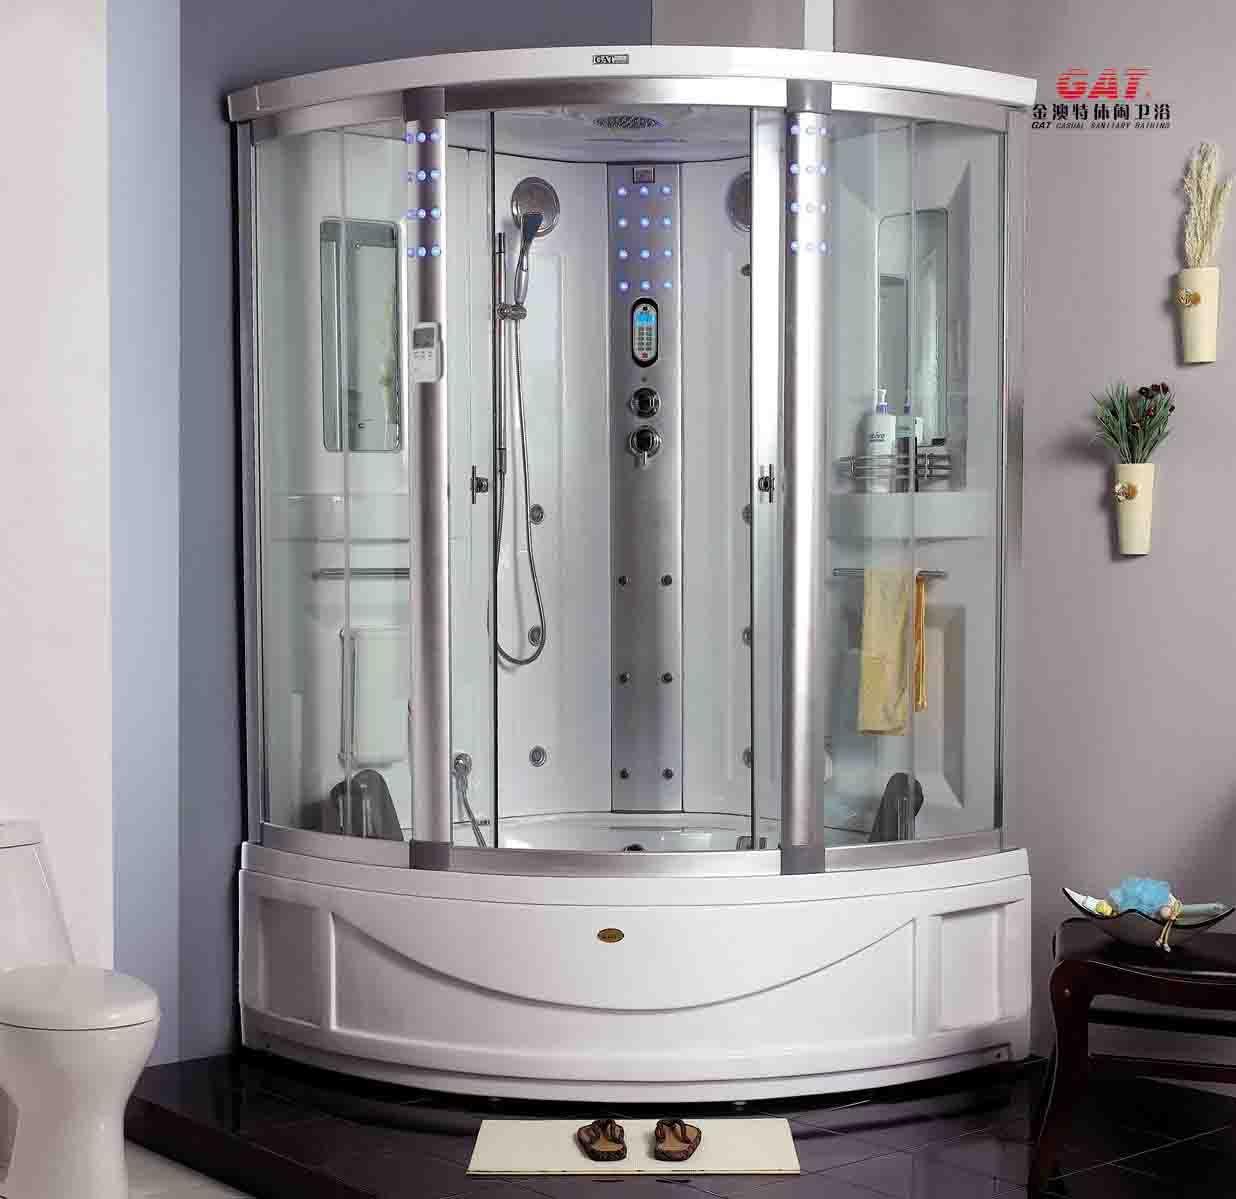 Computerized Steaming Bathroom Bathroom Shower Jacuzzi Steam Room